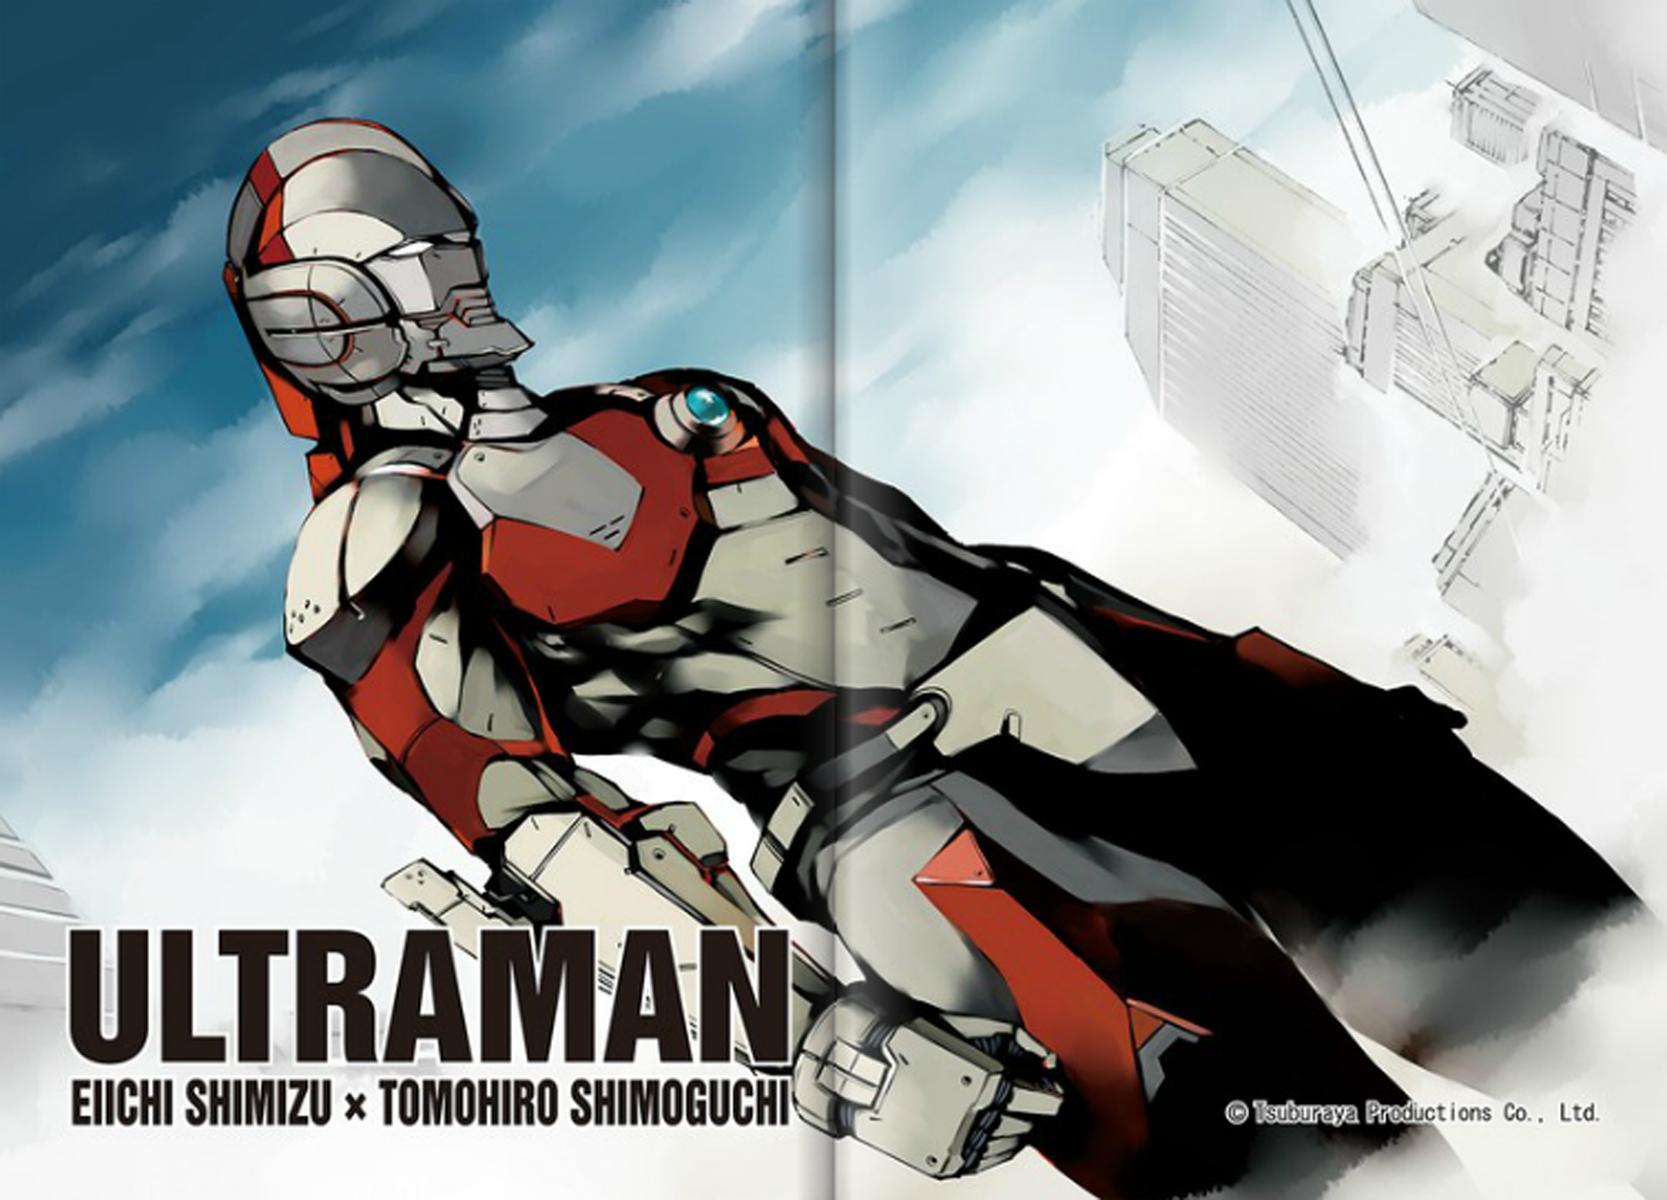 Ultraman 2011 Manga Ultraman Wiki Fandom Powered By